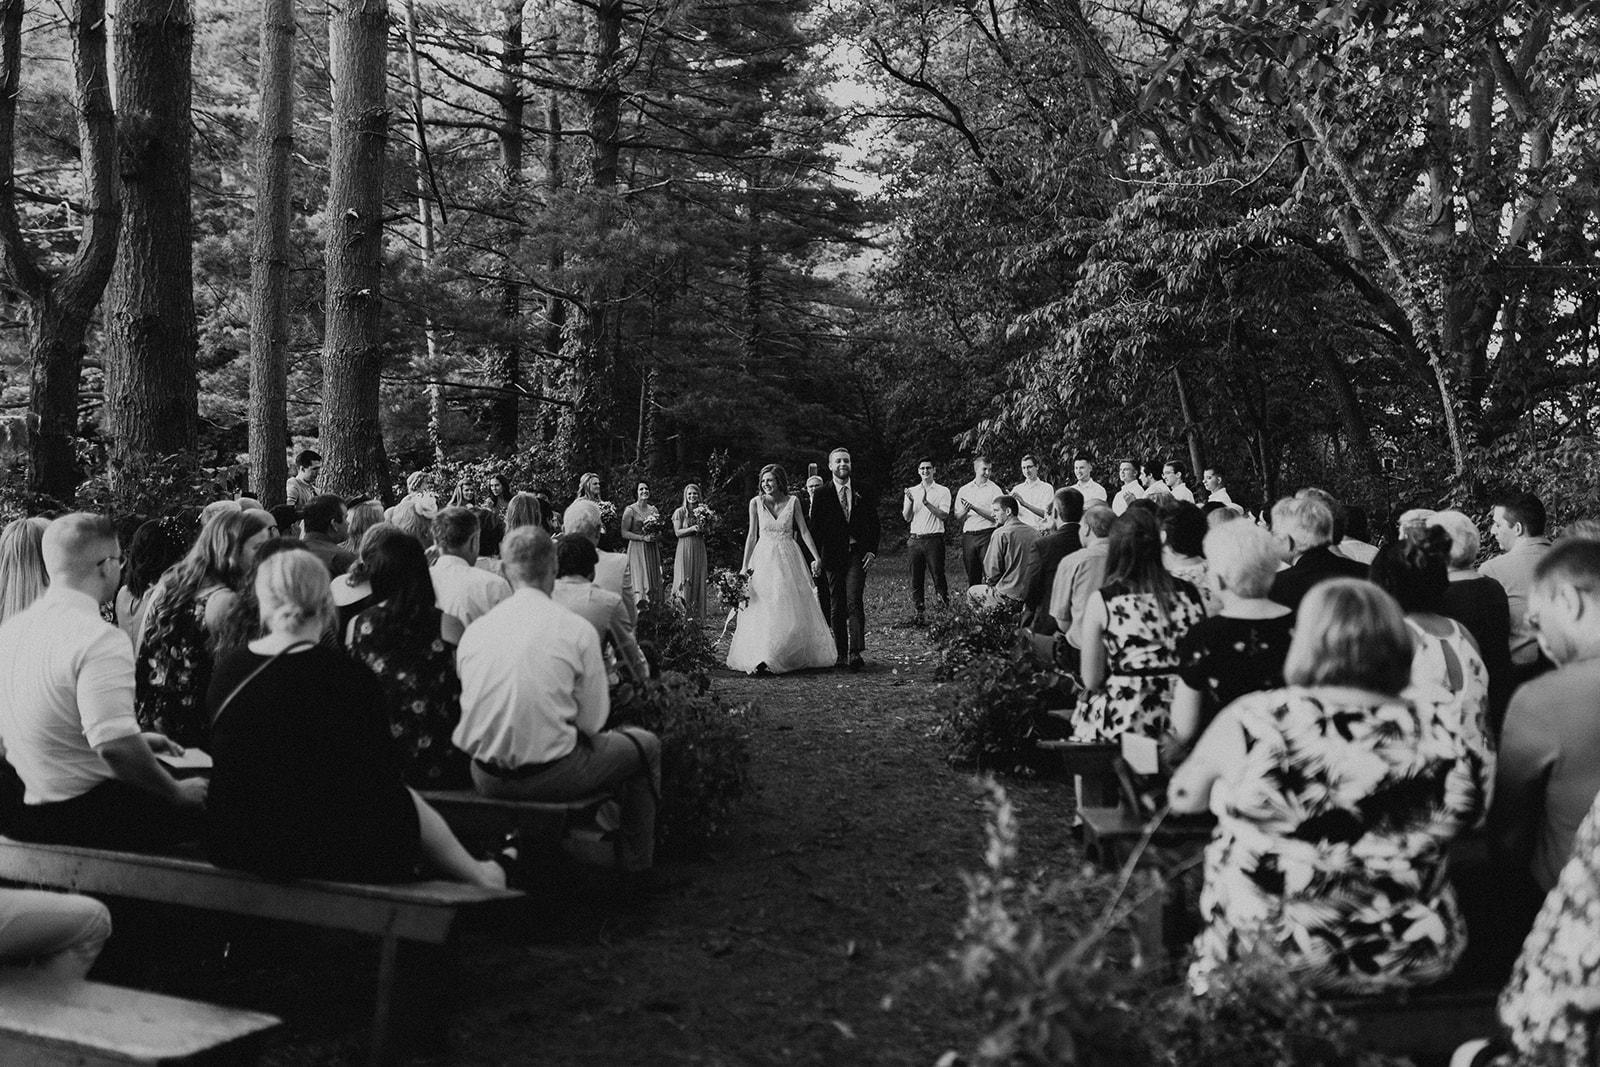 camp_wokanda_peoria_illinois_wedding_photographer_wright_photographs_bliese_0281.jpg